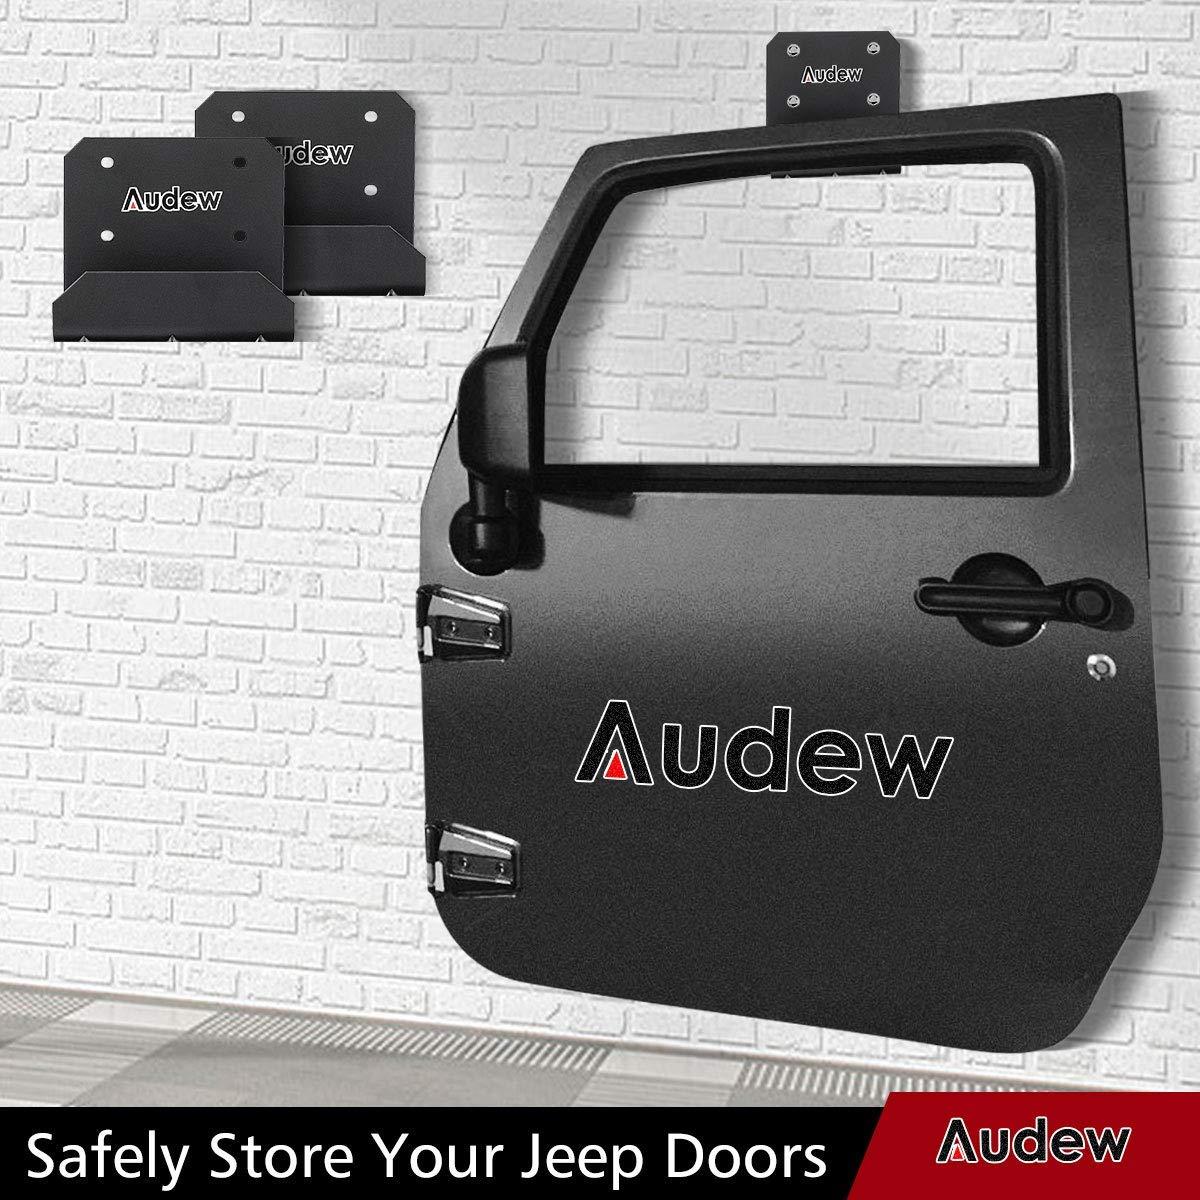 Audew Jeep Wrangler Door Hanger Storage Rack Set of 2 Hangers with 8 Screws,Vehicle Door on Wall Holder Bracket Fits for Jeep Wrangler CJ//YJ//TJ//LJ//JKU//JL